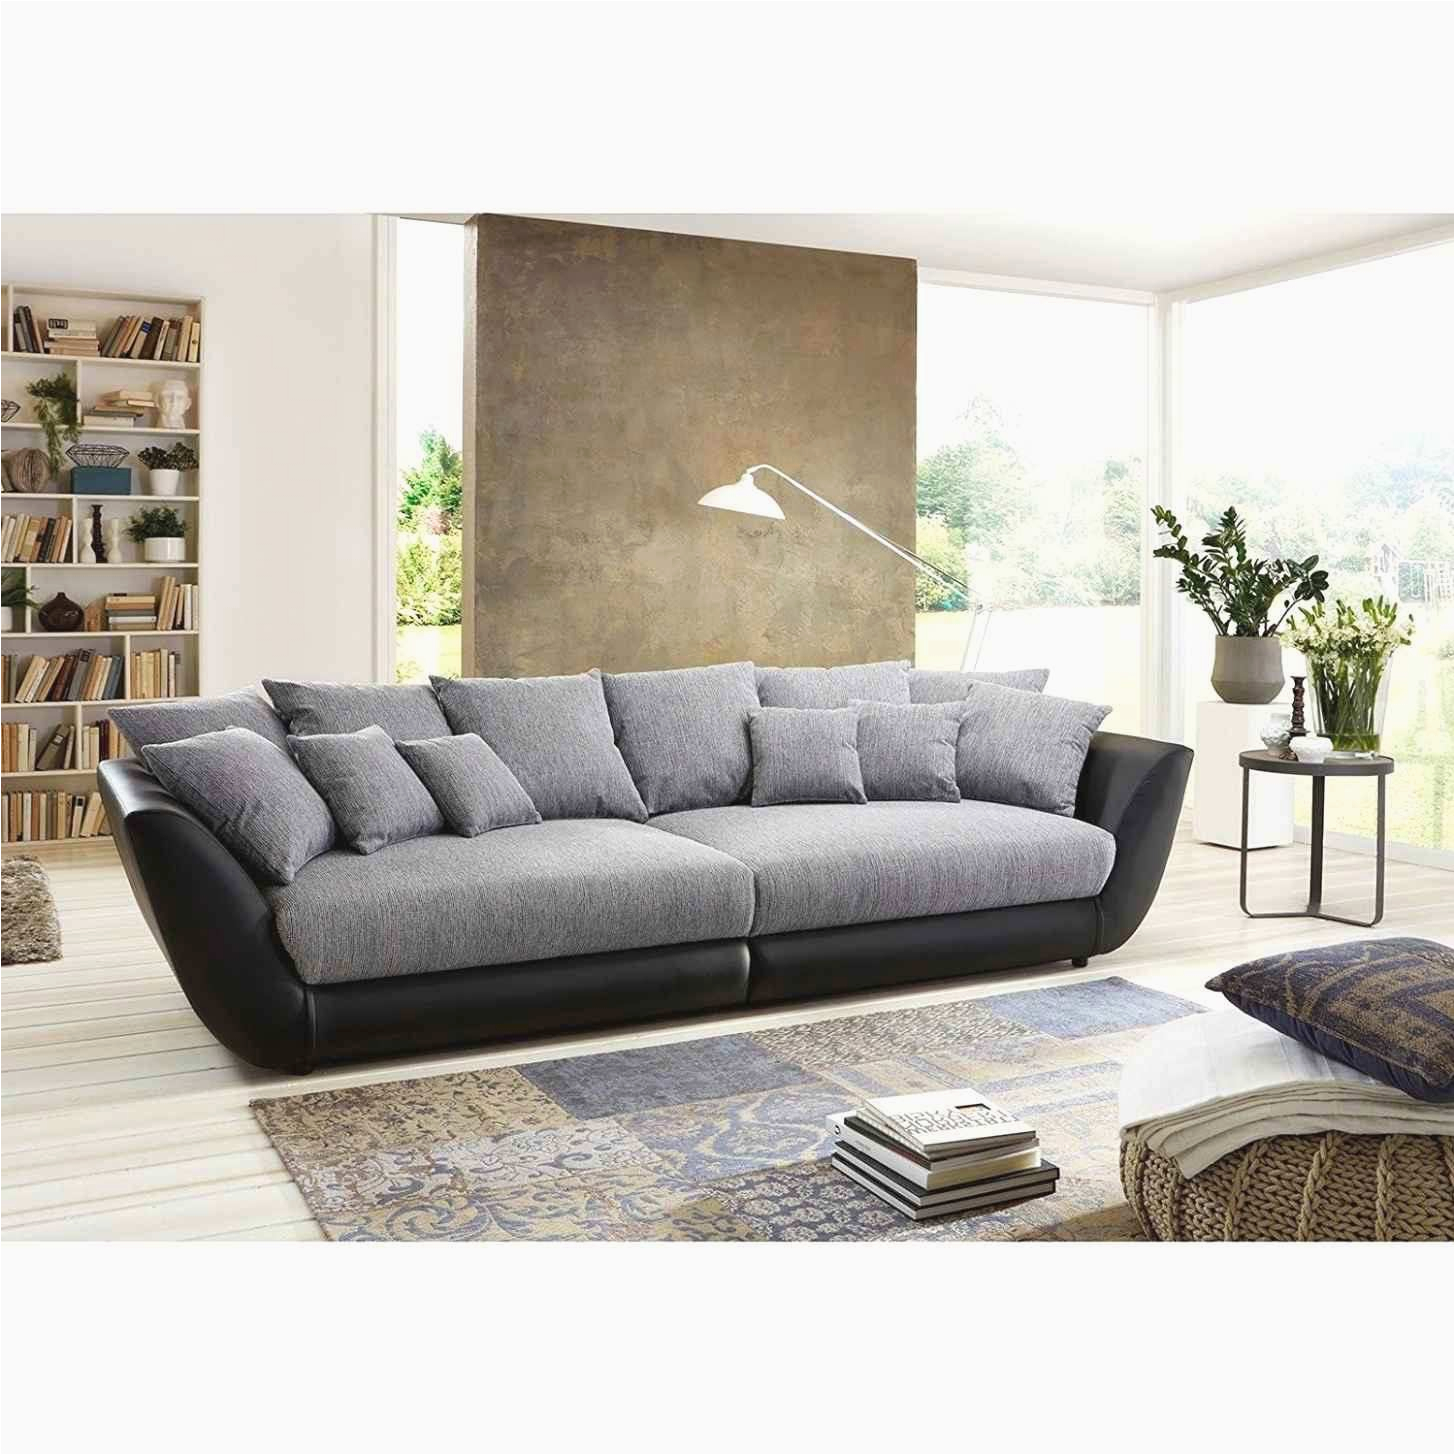 sofa grau stoff das beste von 41 einzigartig designer couch leder leroy merlin seche of sofa grau stoff